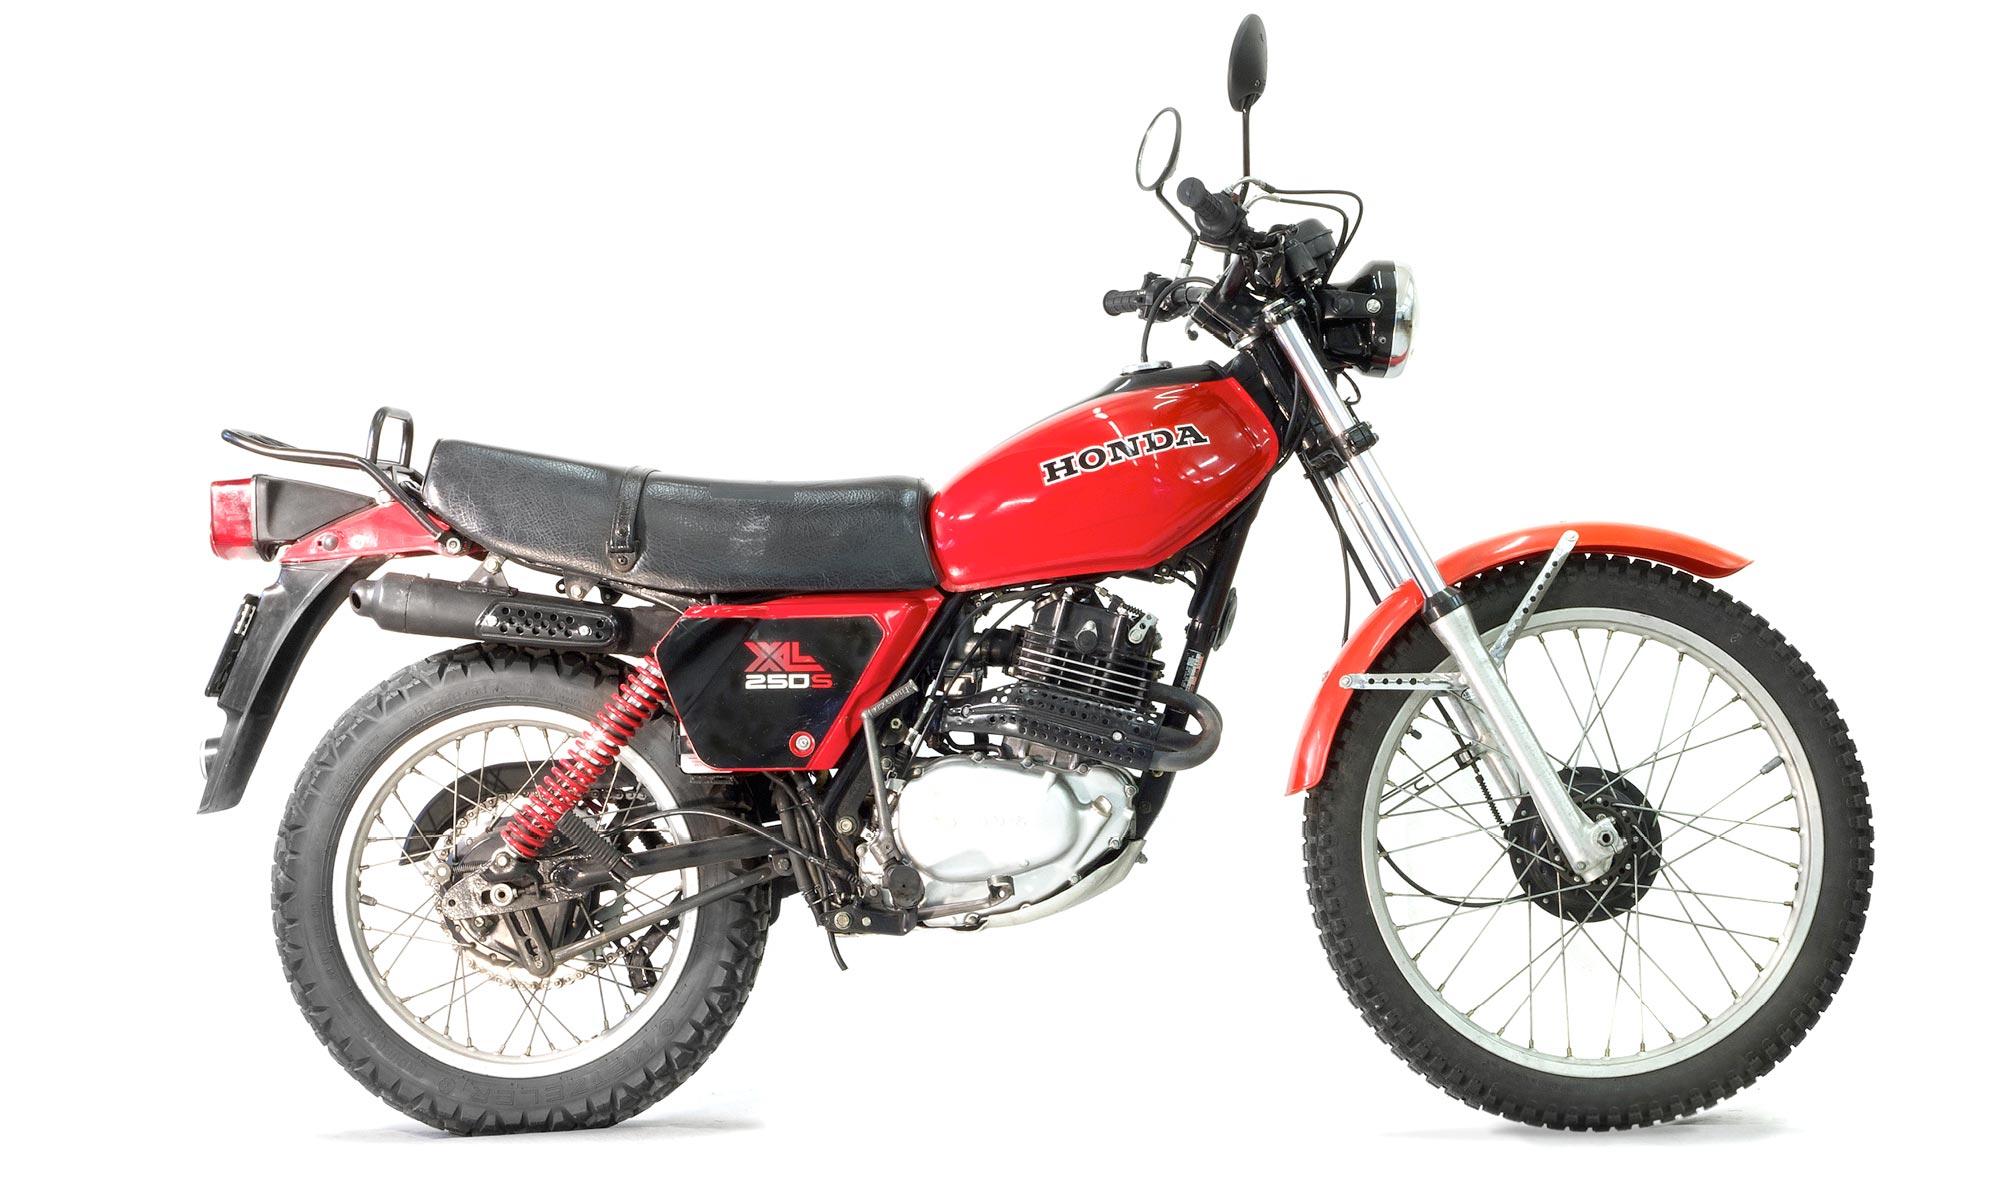 Honda_XL_250s_Rot